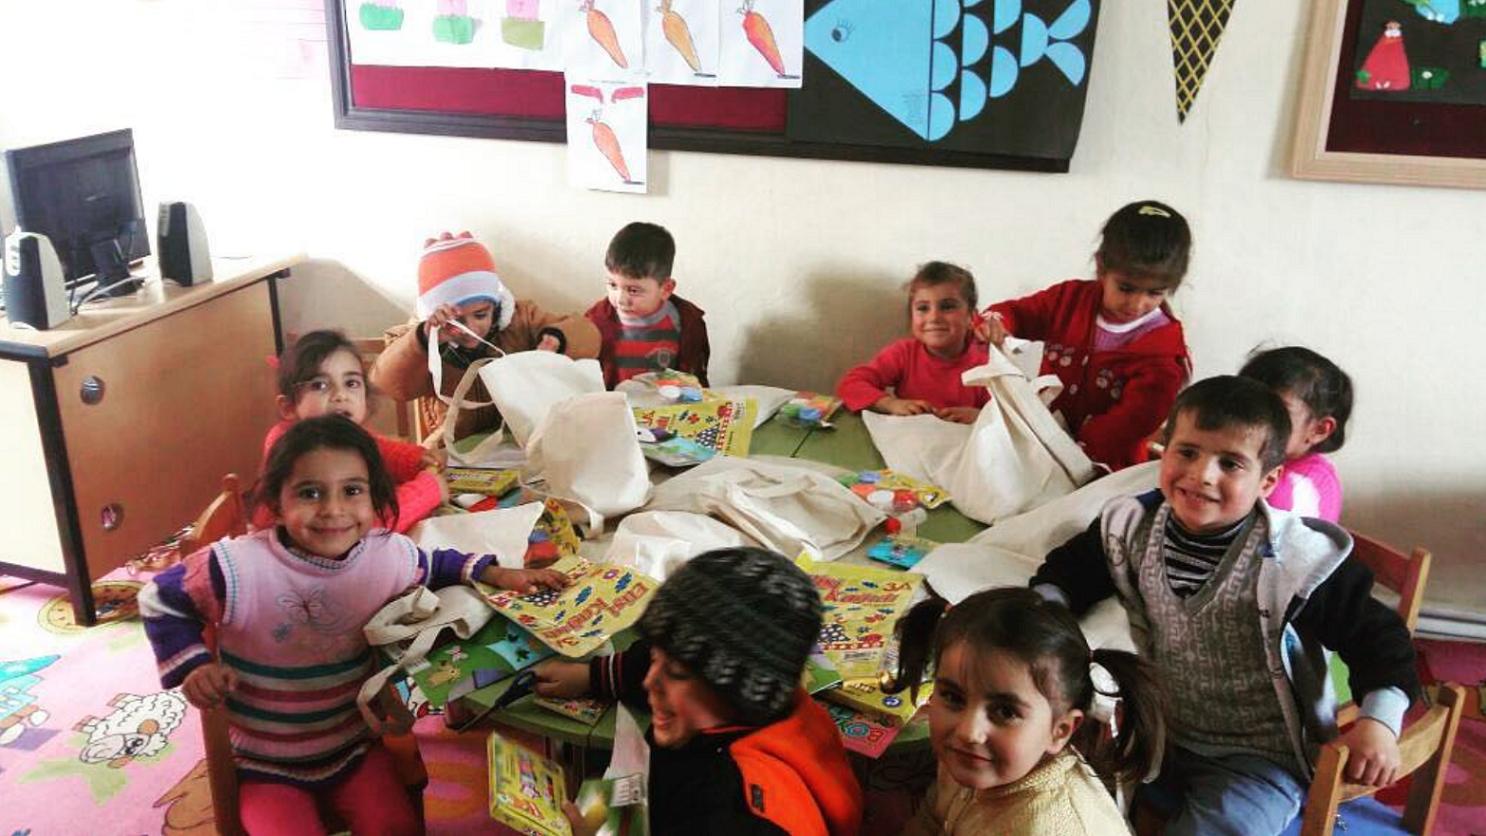 24.11.2016 / Anaokulu Seti Yardımı [Van – Gevaş Hasbey Köyü Anaokulu]